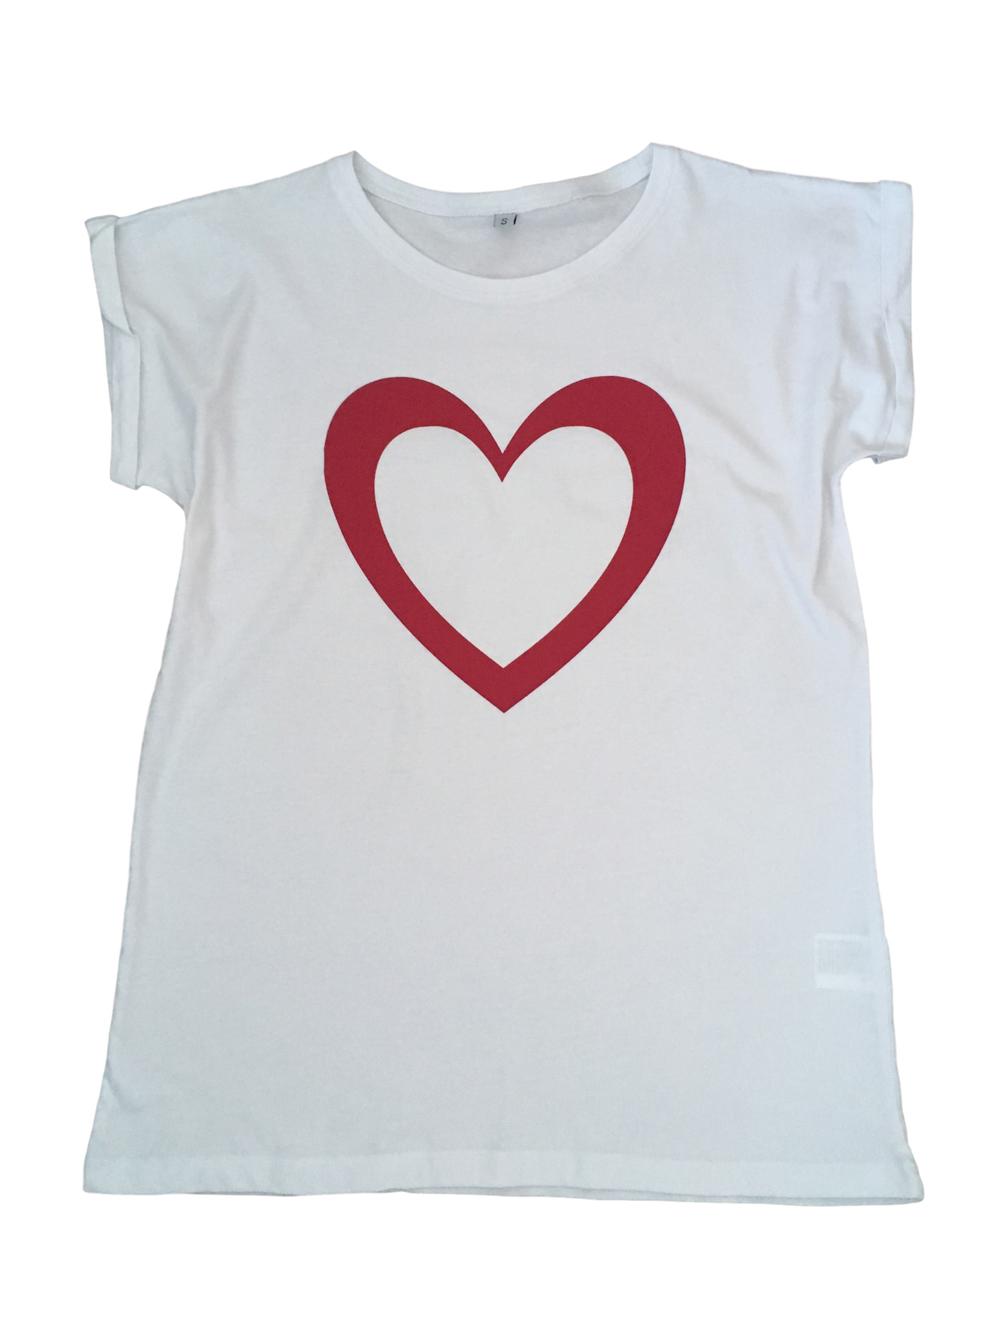 Heart Slouch Tshirt